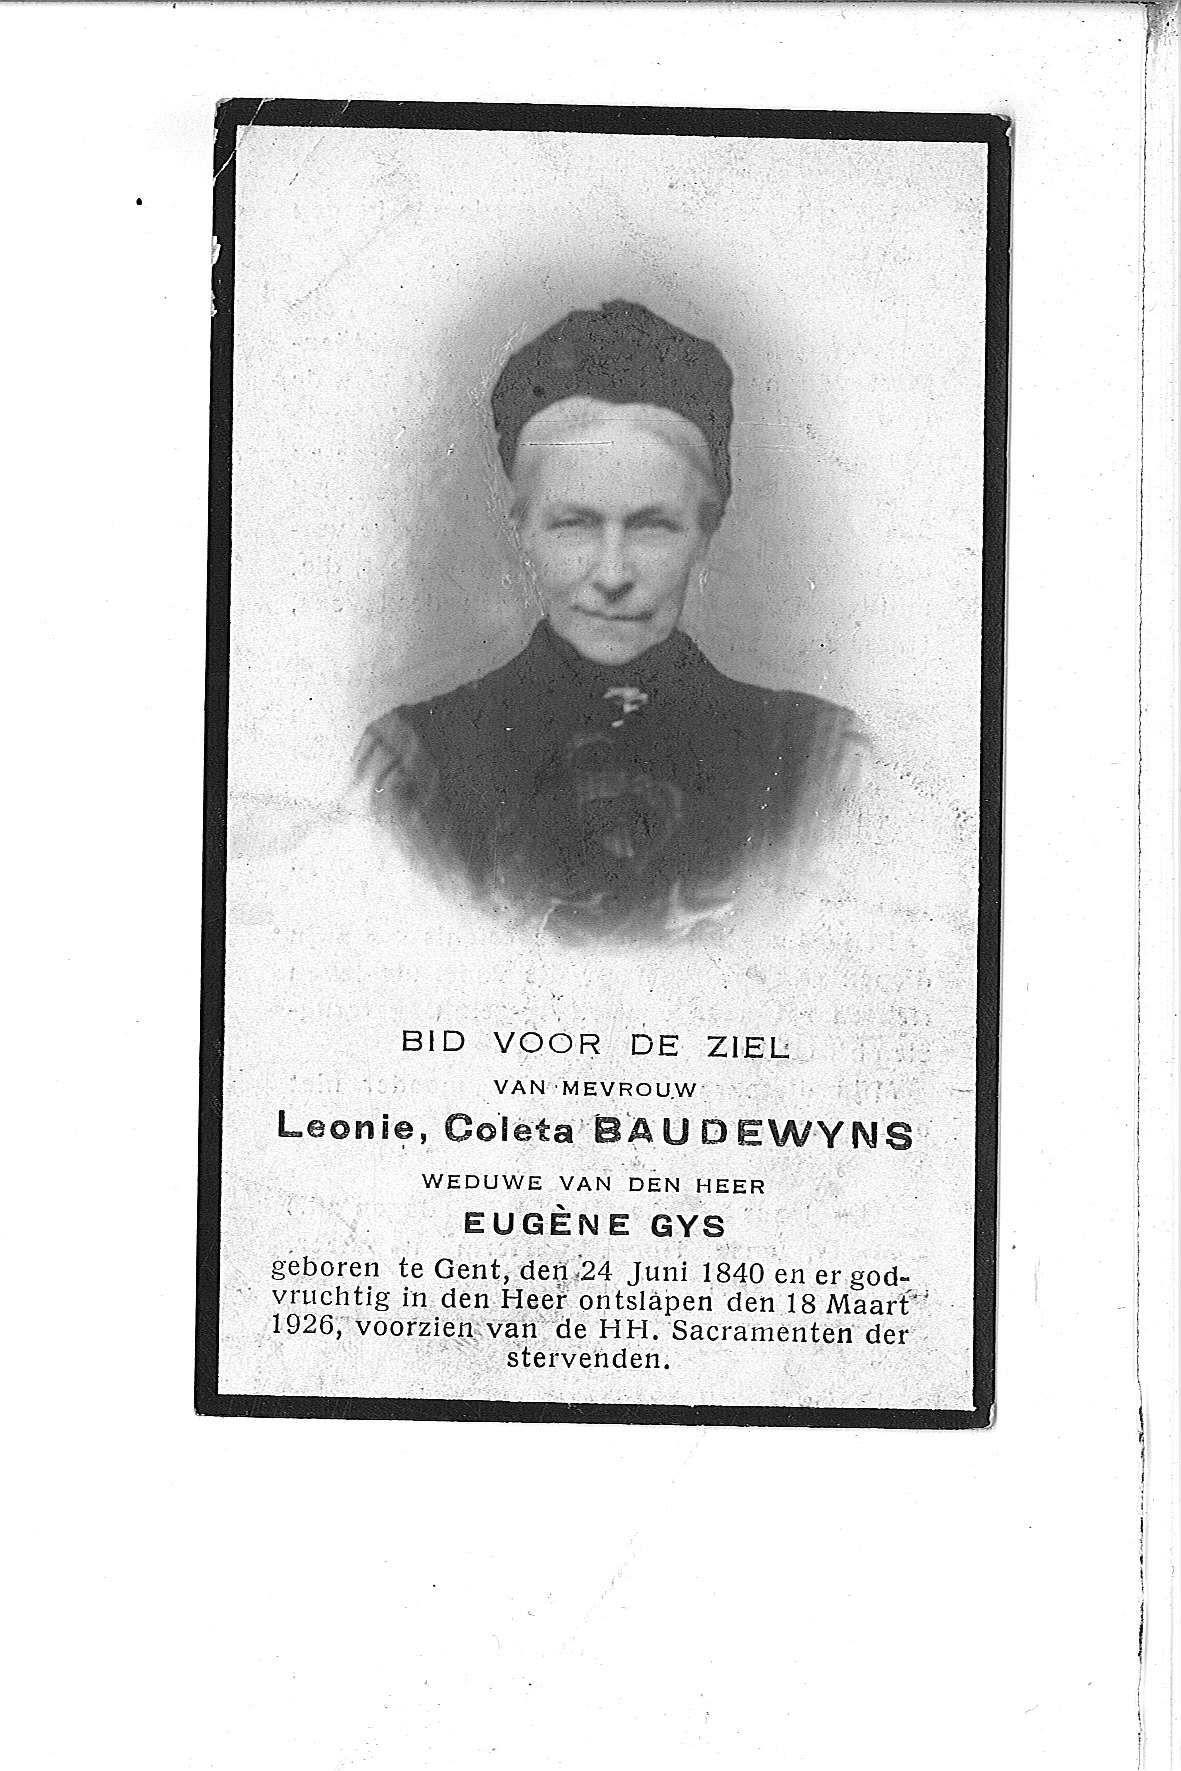 Leonie-Coleta(1926)20101022082750_00026.jpg